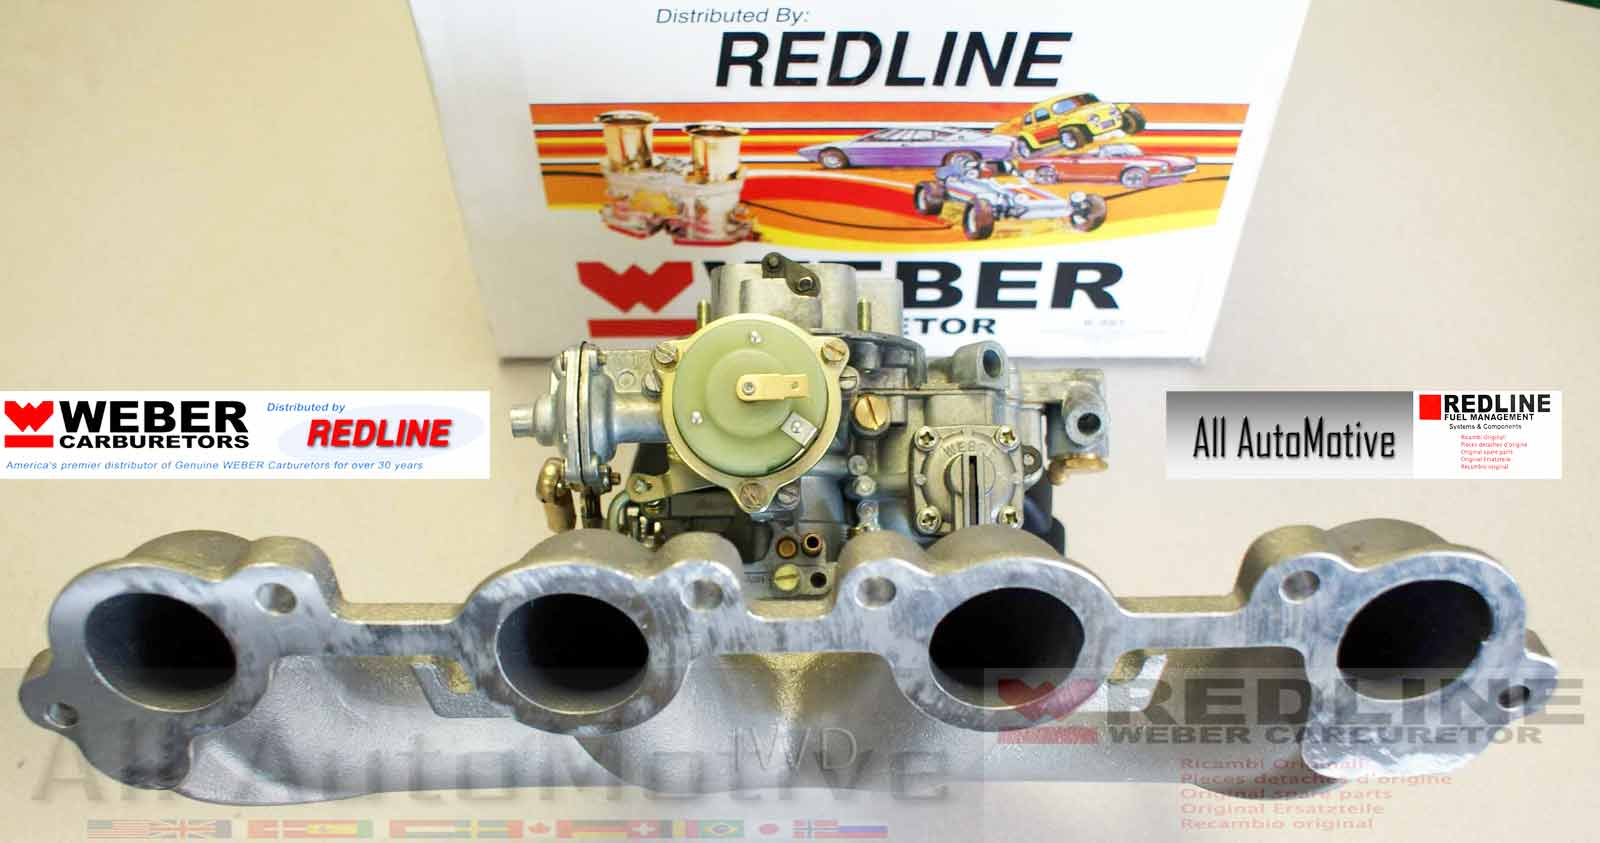 volvo penta carburetor aq125 aq145 aq131 weber carburetor conversion rh ebay com Volvo Penta 275 Outdrive Volvo Penta Parts